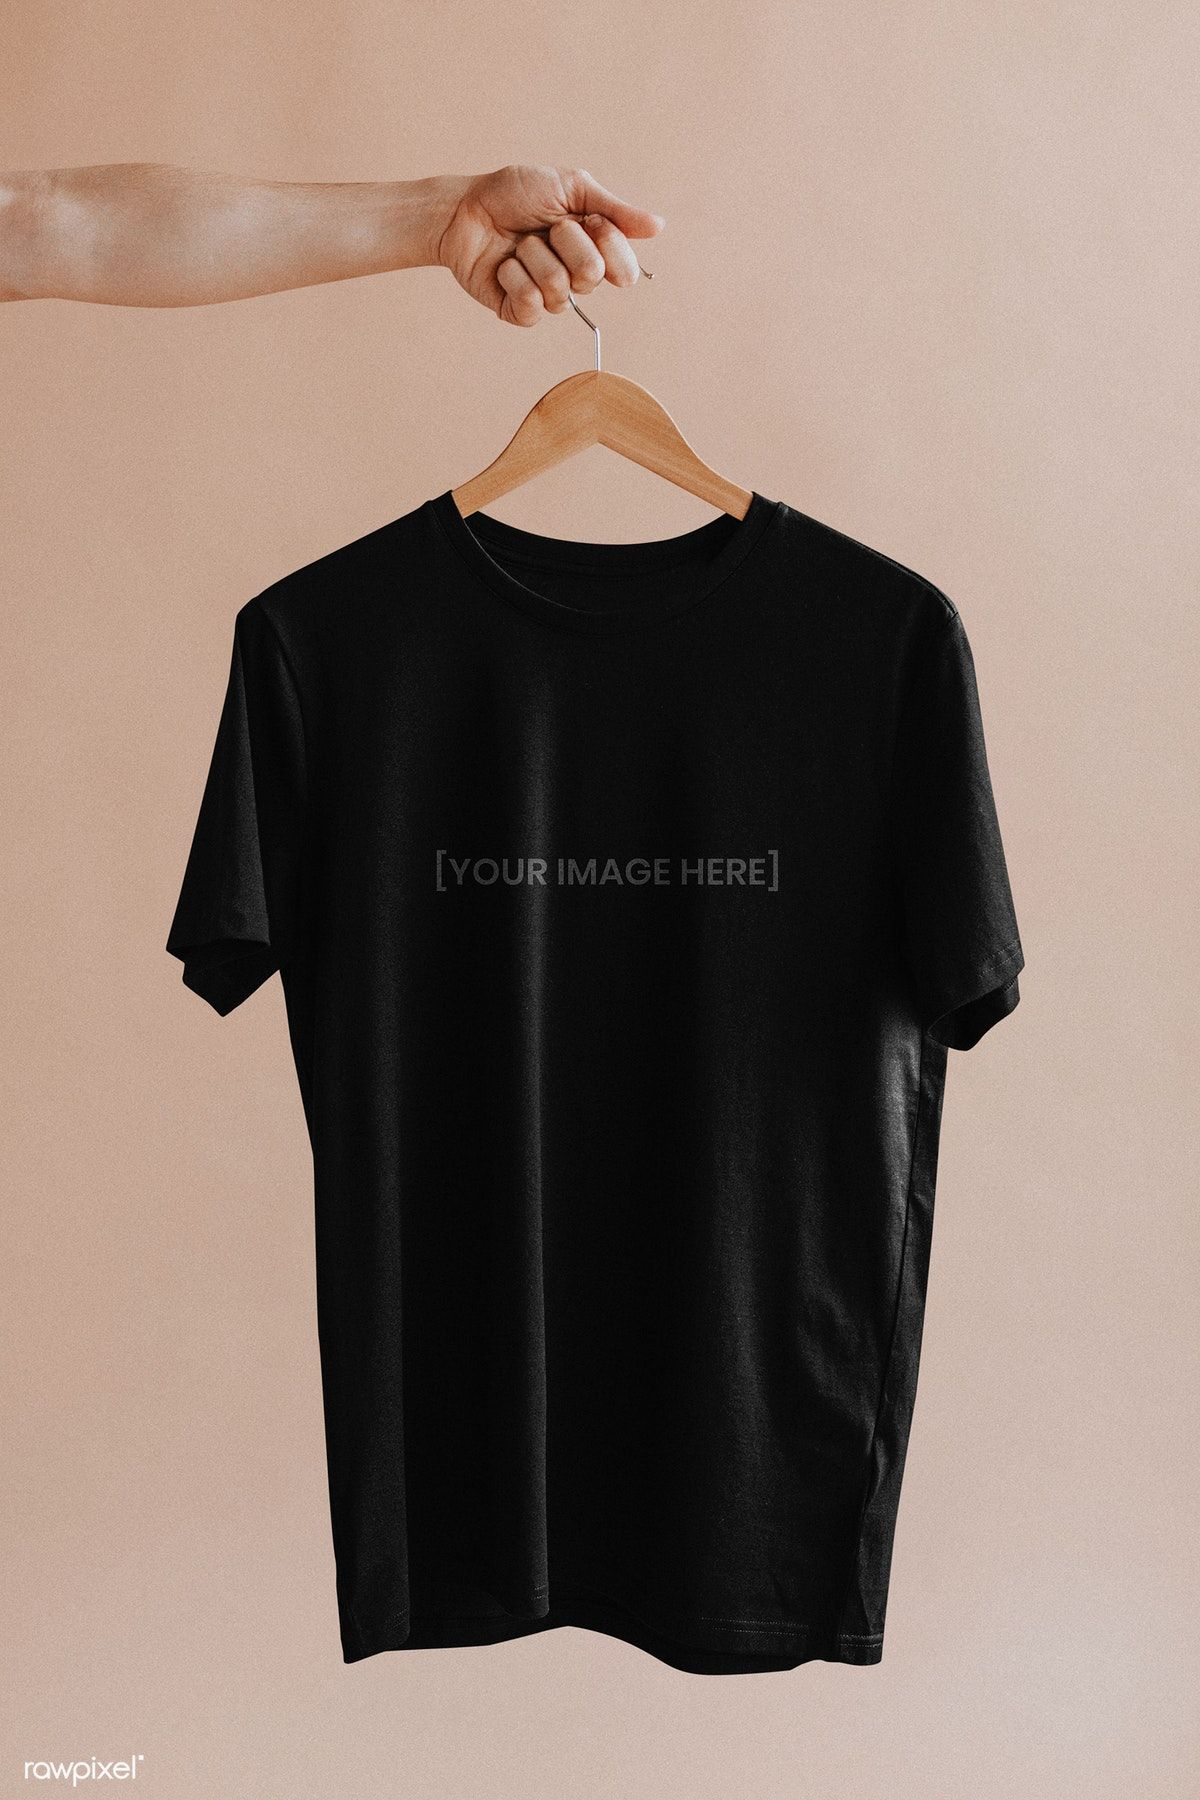 Download Download Premium Psd Of Shirt In A Hanger Mockup 1216446 Minimal Shirt Design Photography Shirts Clothing Mockup